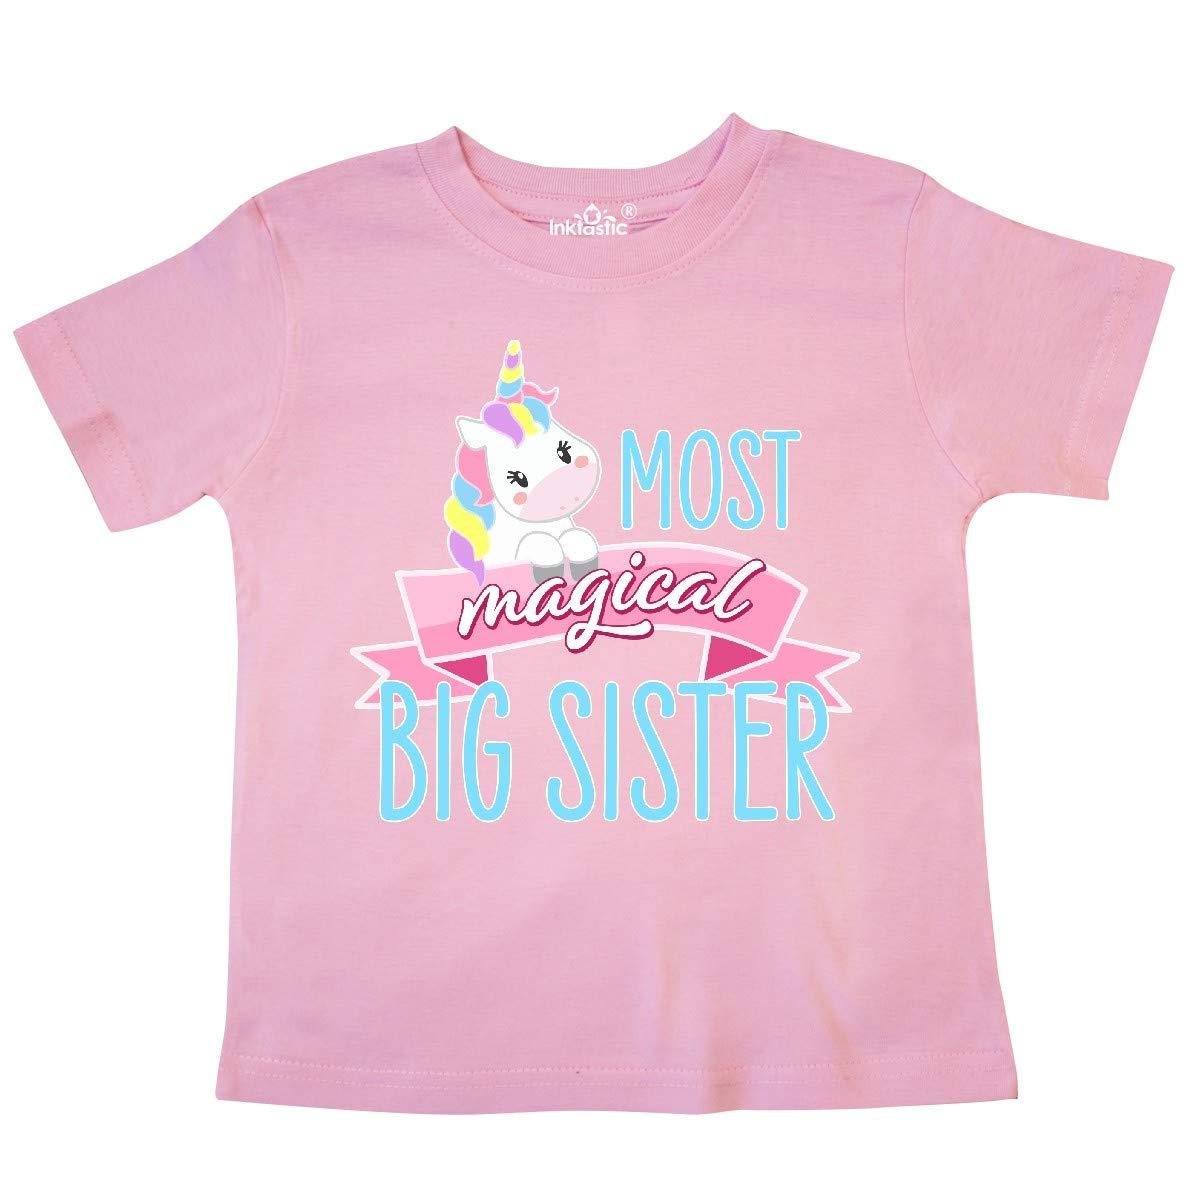 Cute Unicorn Toddler T-Shirt inktastic Most Magical Big Sister